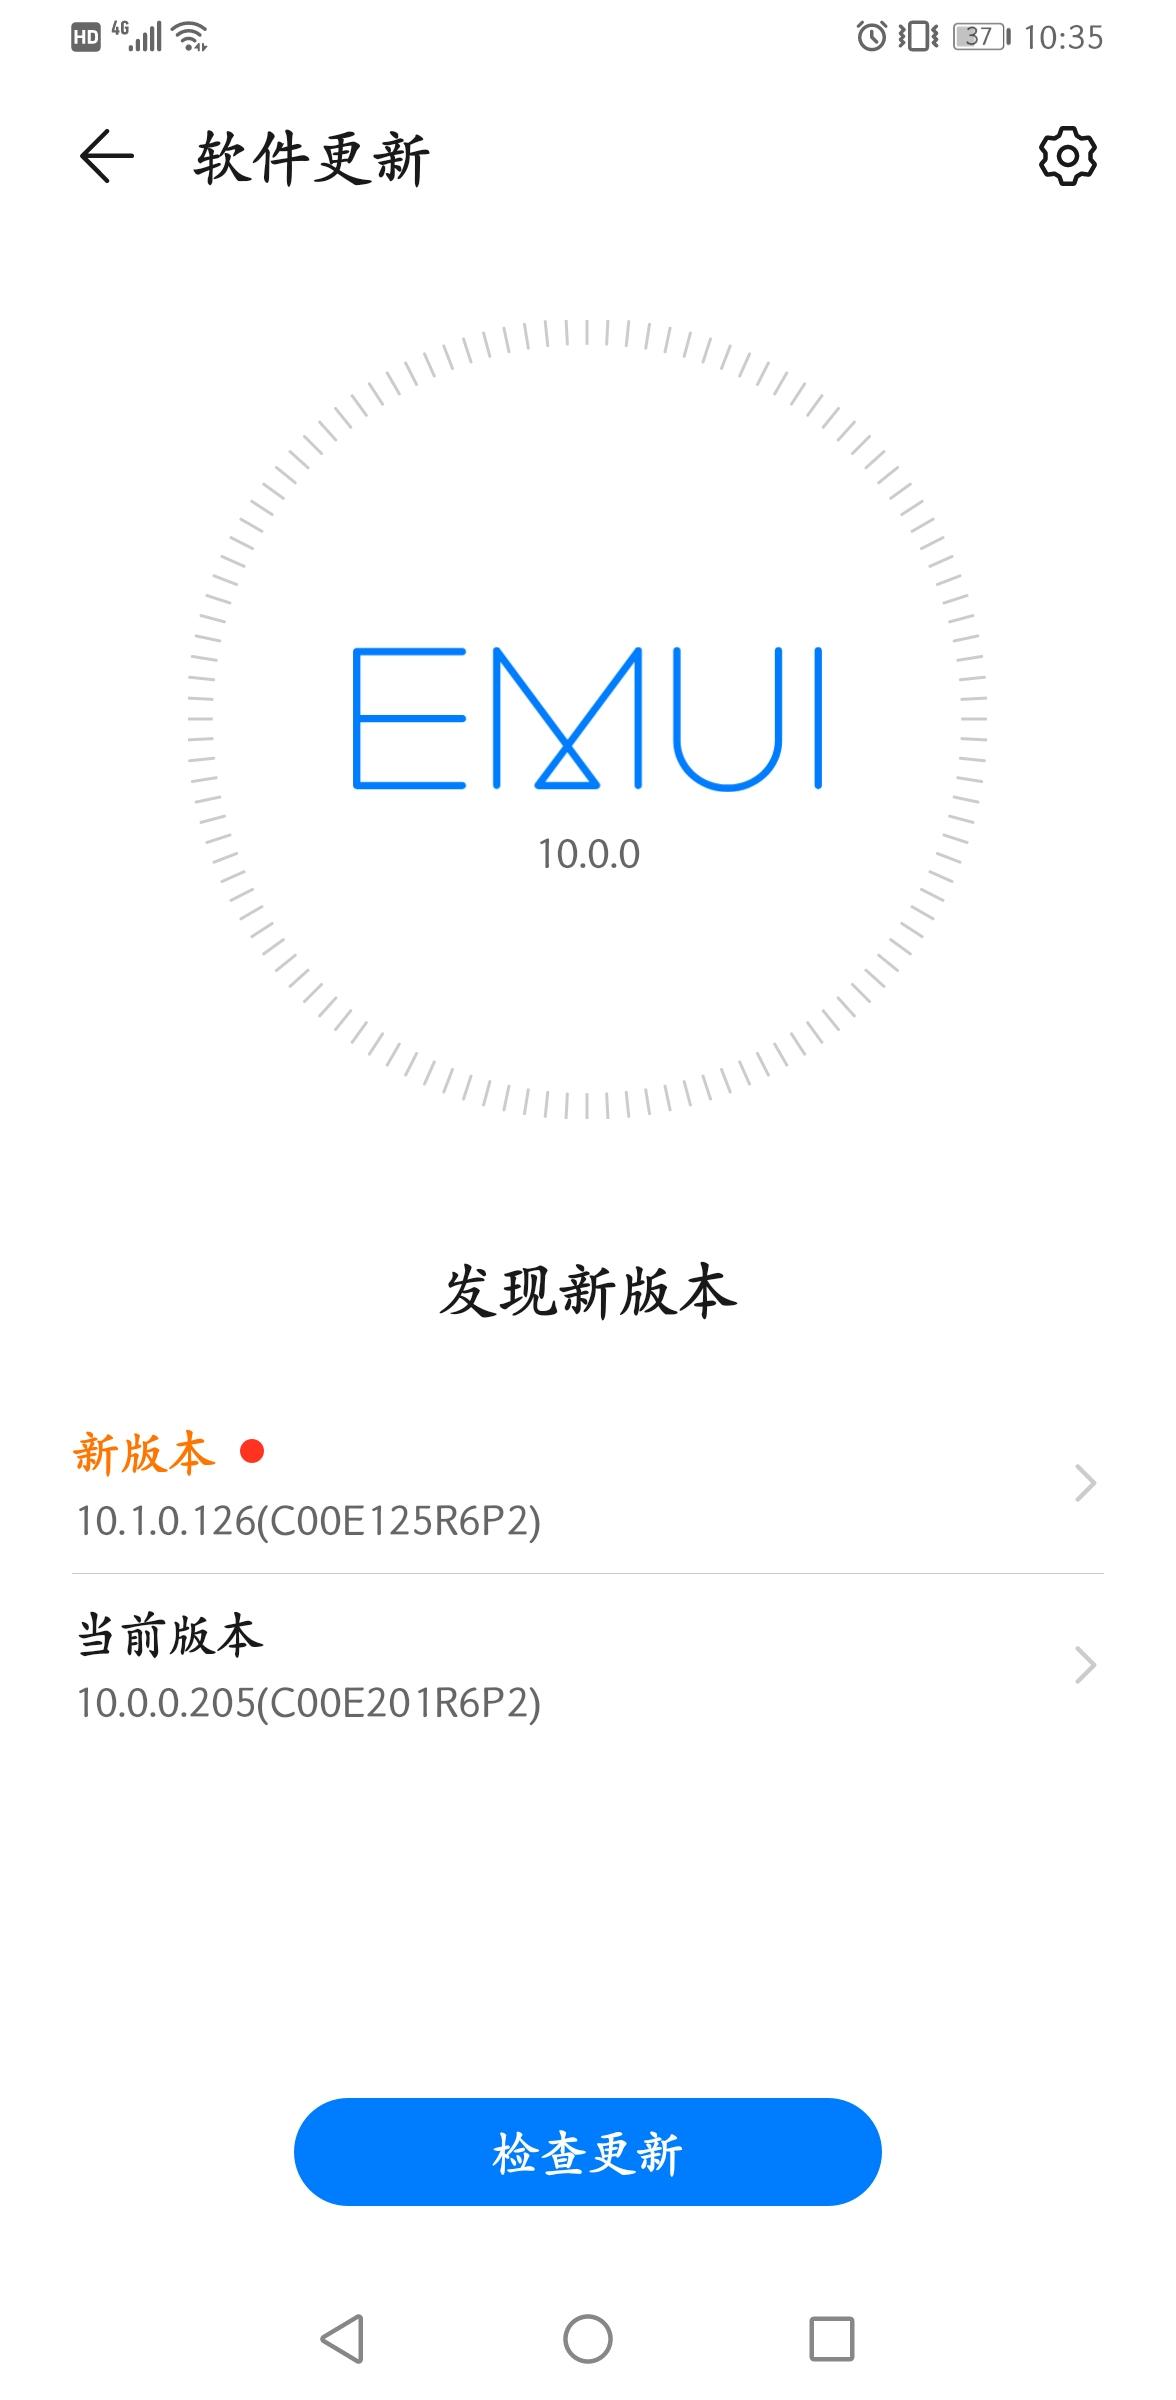 Screenshot_20200515_103548_com.huawei.android.hwouc.jpg